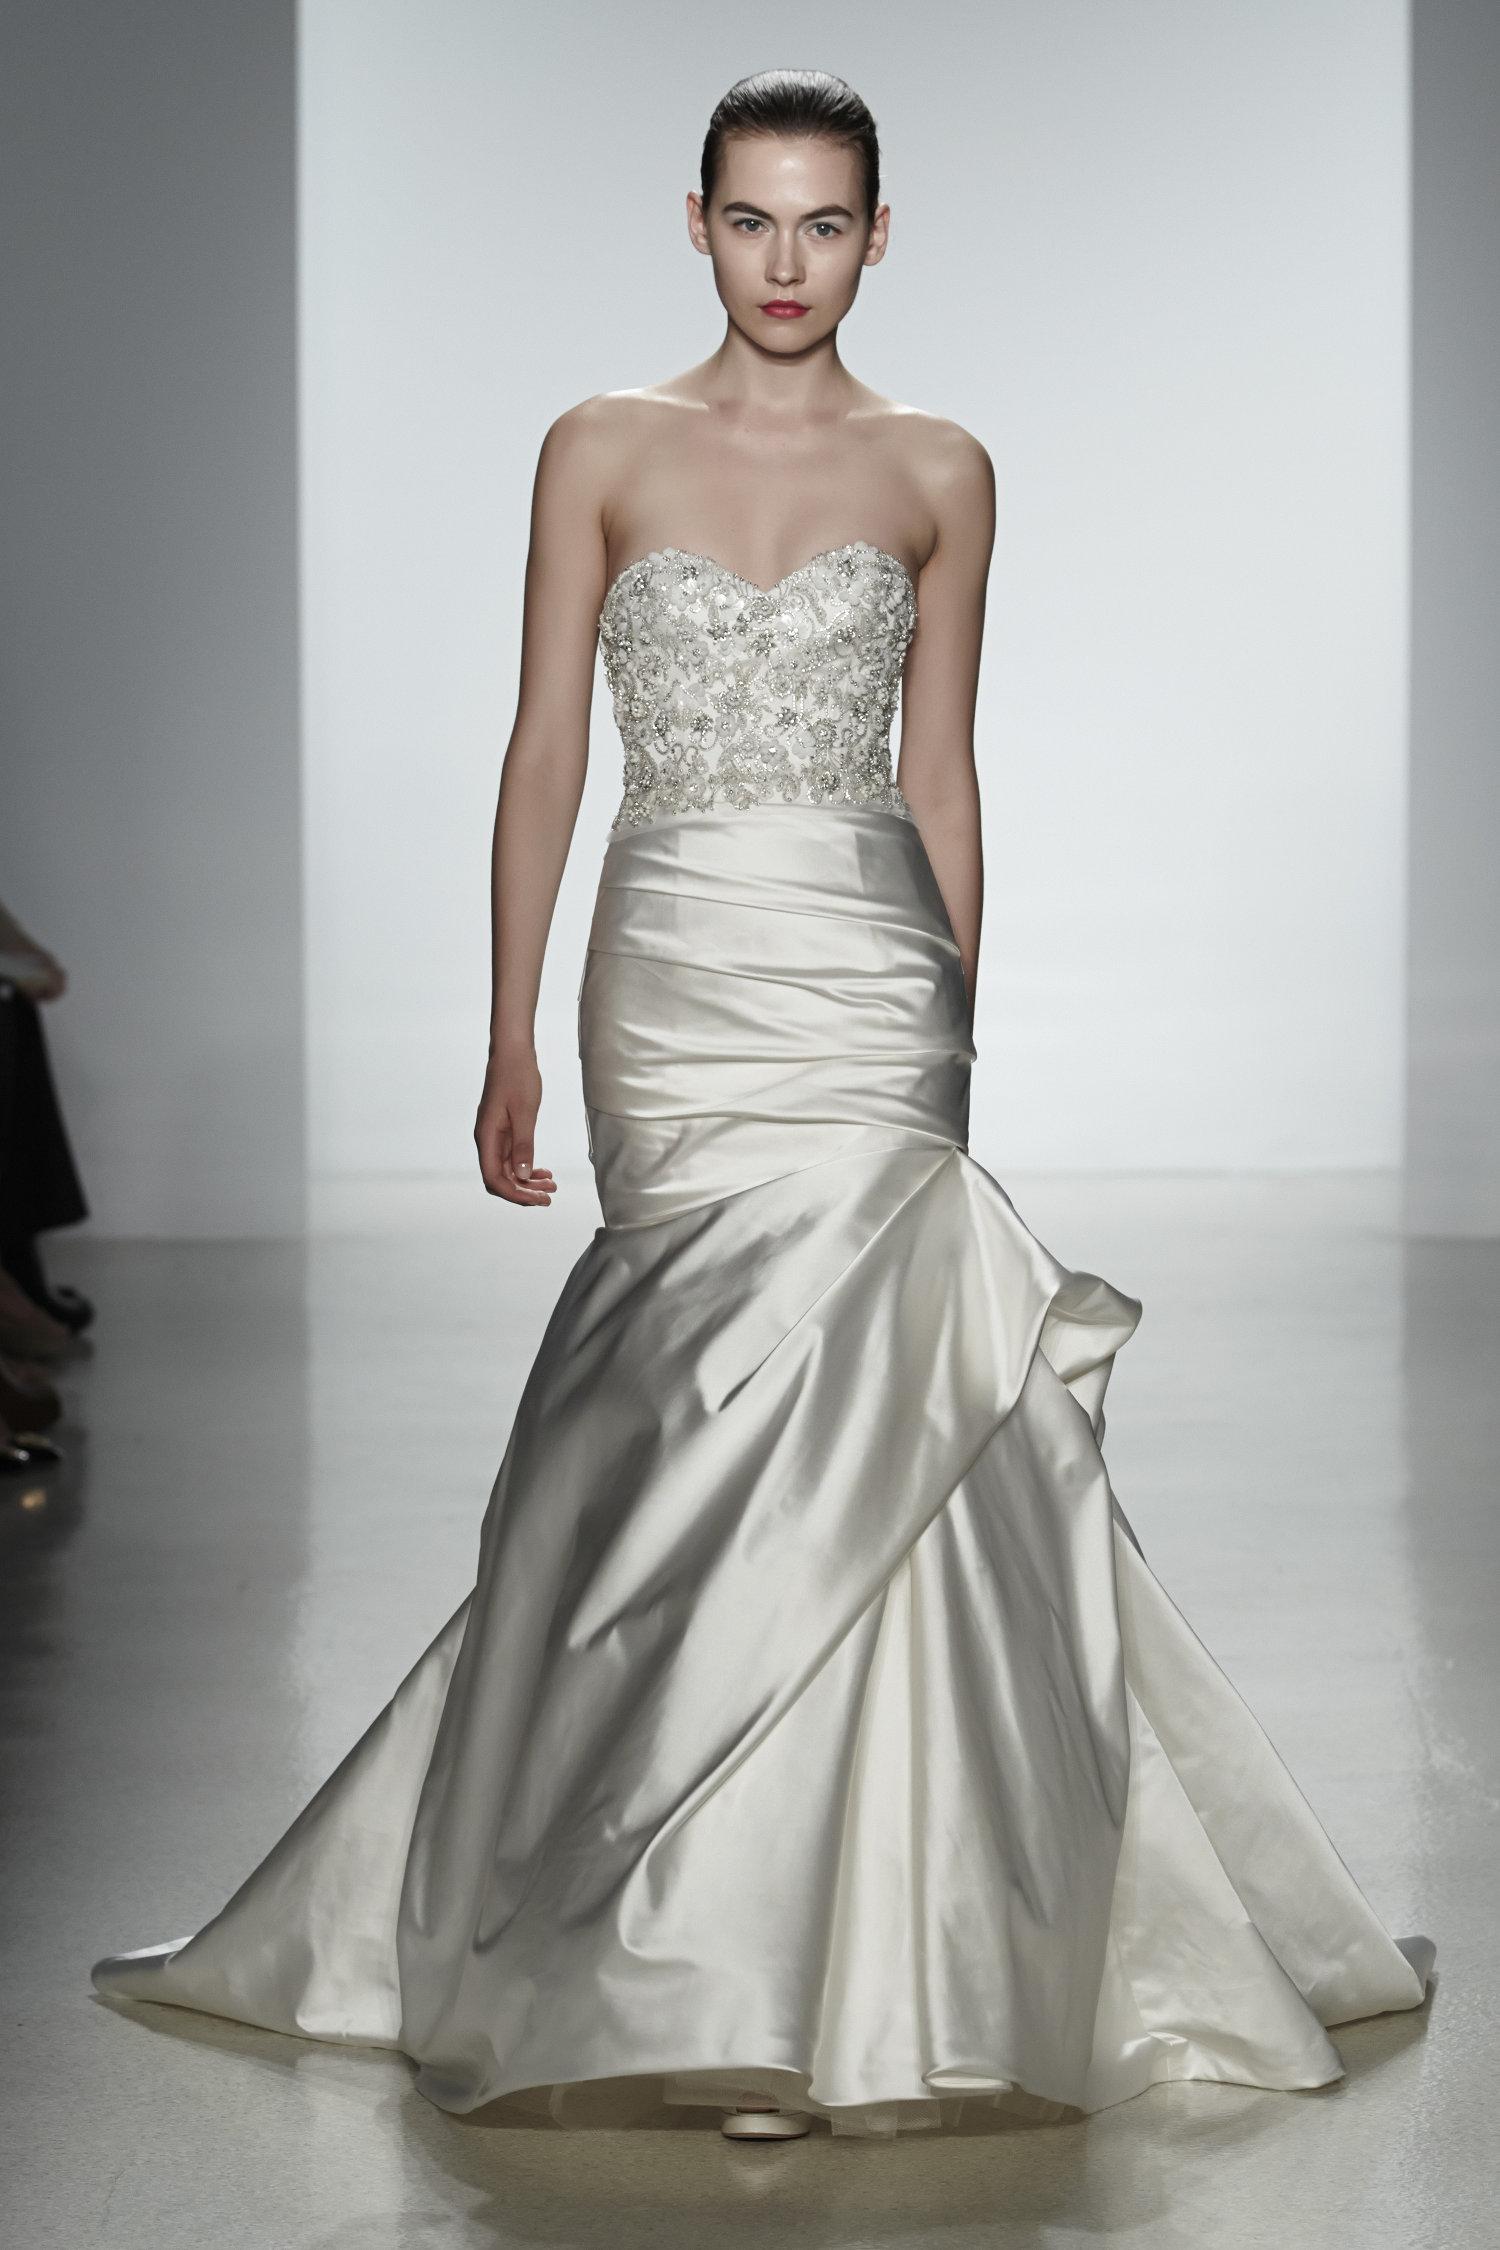 Search - Kenneth Pool - Wedding Dresses, Bridal Gowns